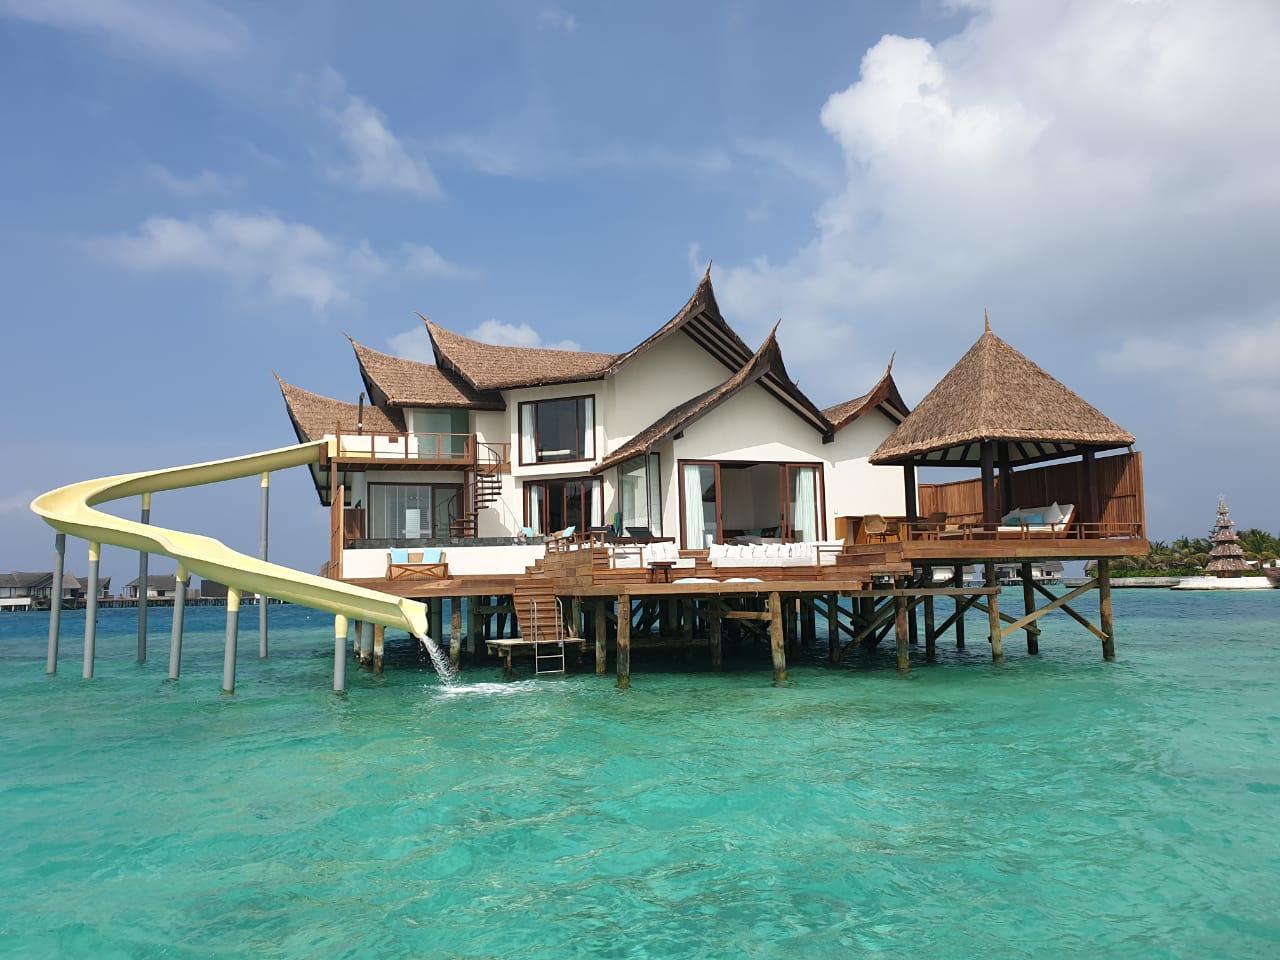 Fiber Thatch Maldives_Jurmeirah Vittaveli Resort 01